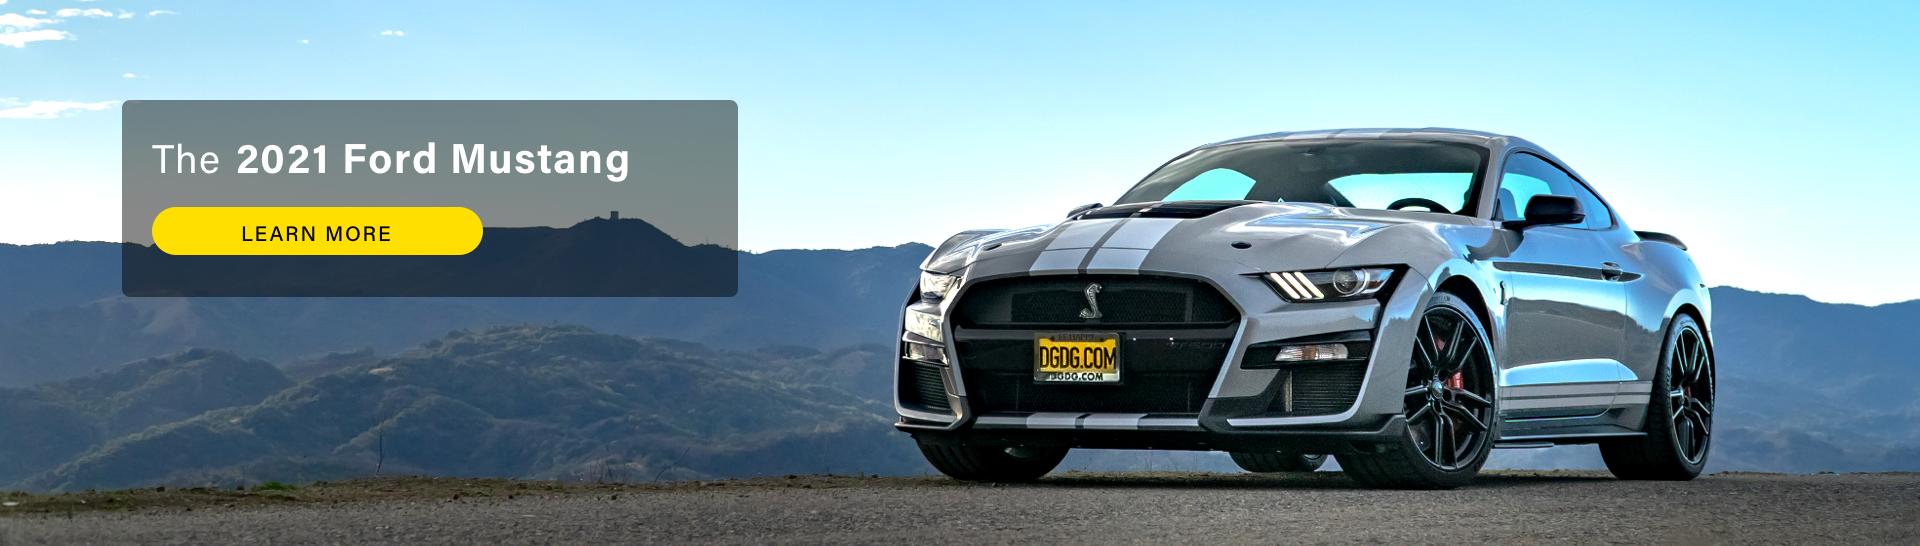 2021_Ford_Mustang_slider_desktop_ver3